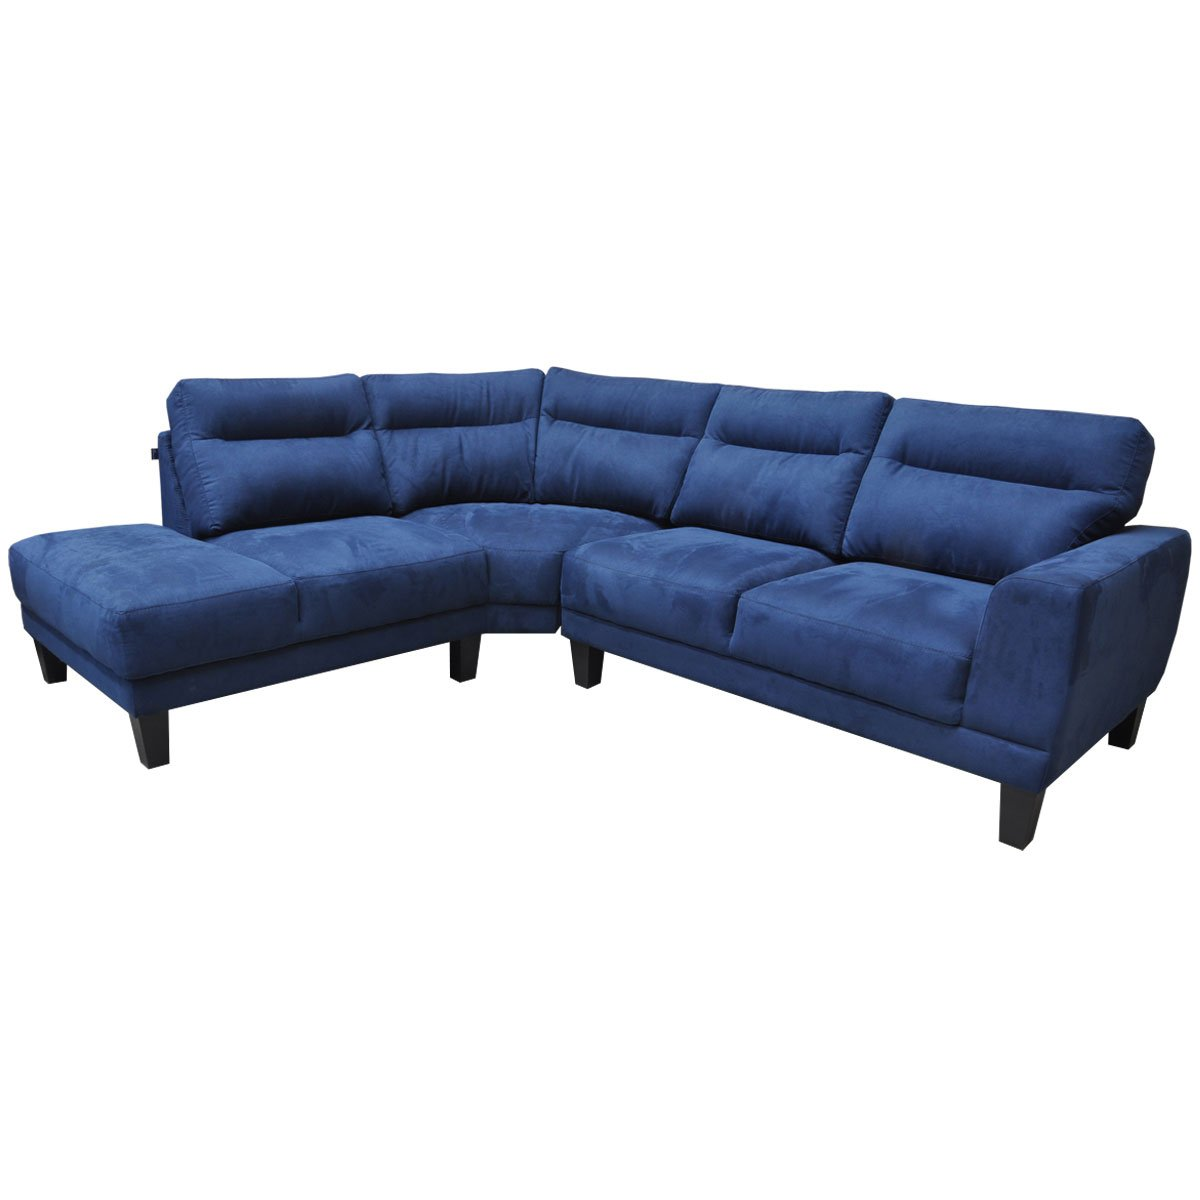 Sala Modular Serra 2 Piezas Izquierda Tapiz Tela Azul Muebles Liz  # Muebles Liz Sears